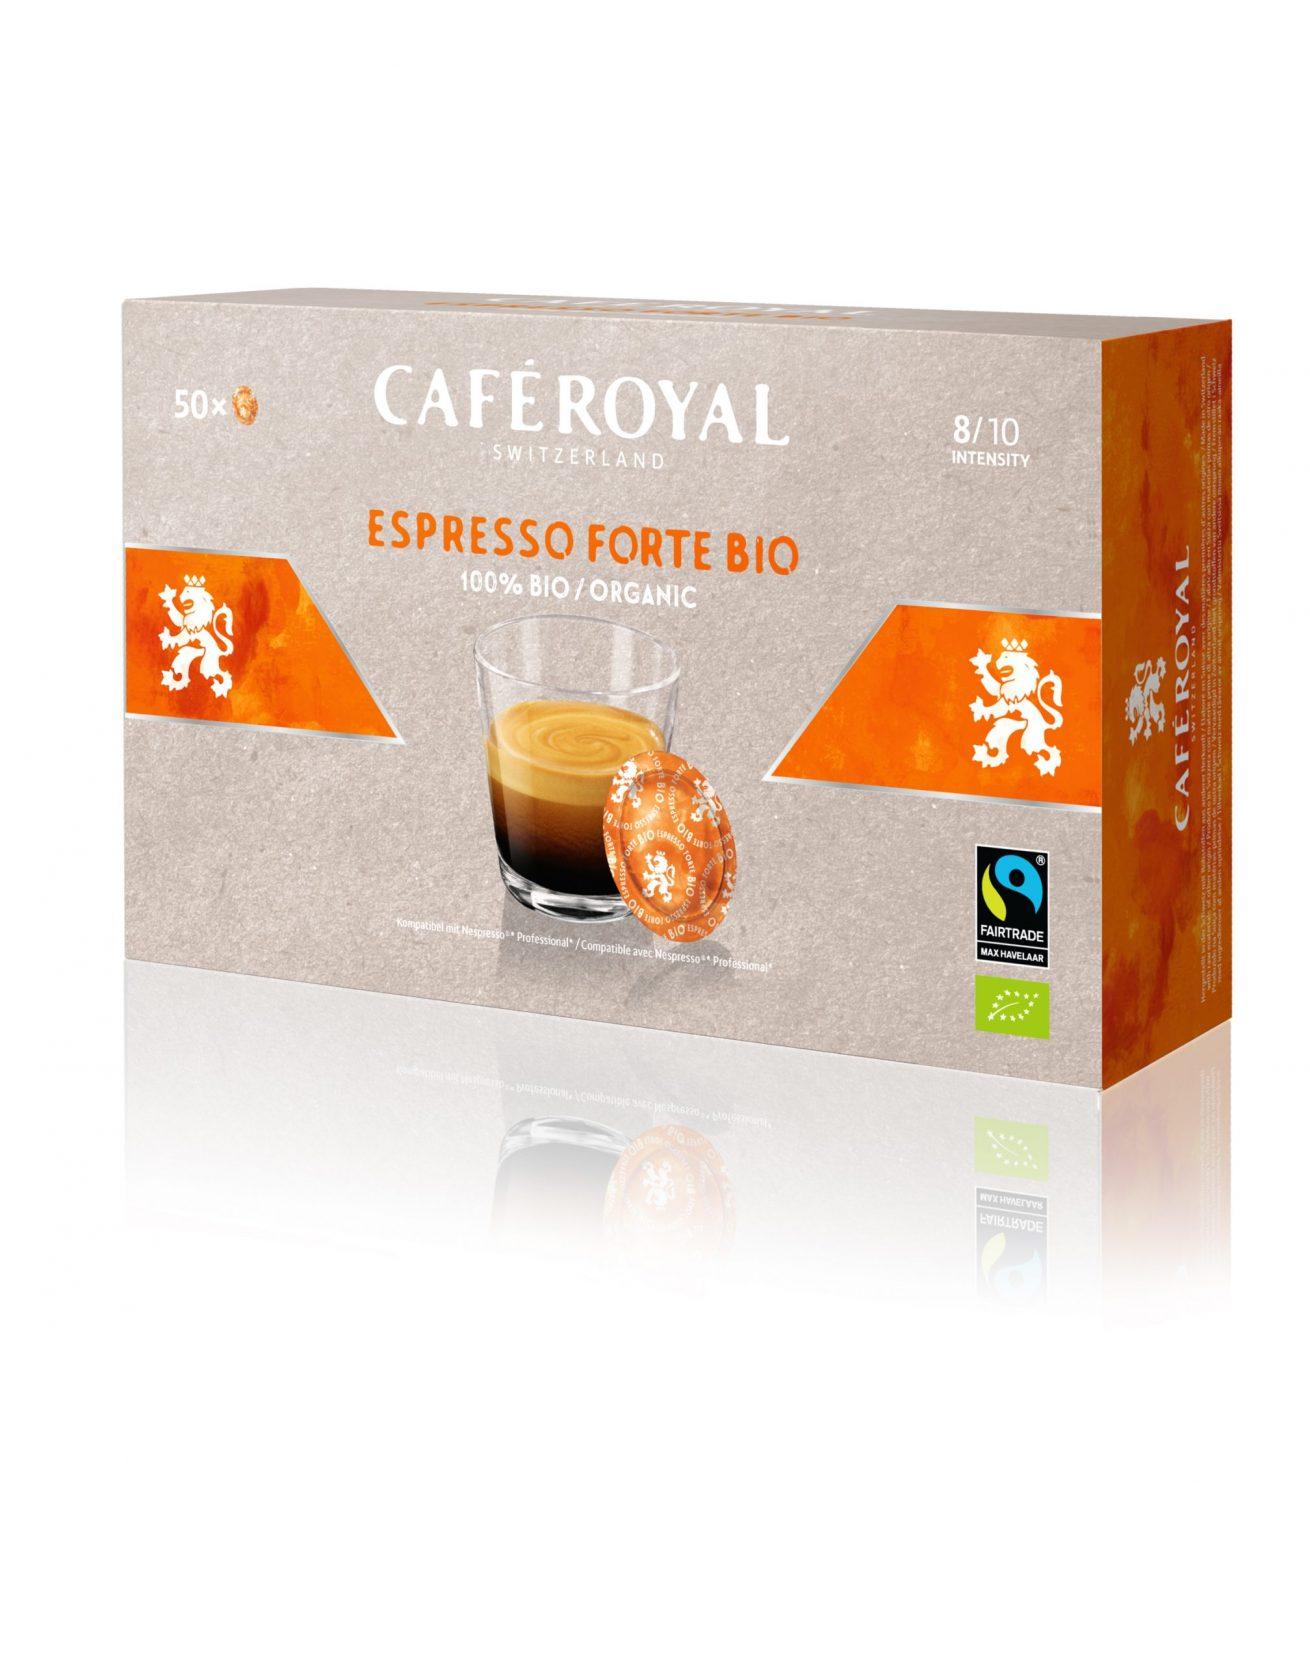 CafeRoyal_ProPad_BioEspressoForte_side